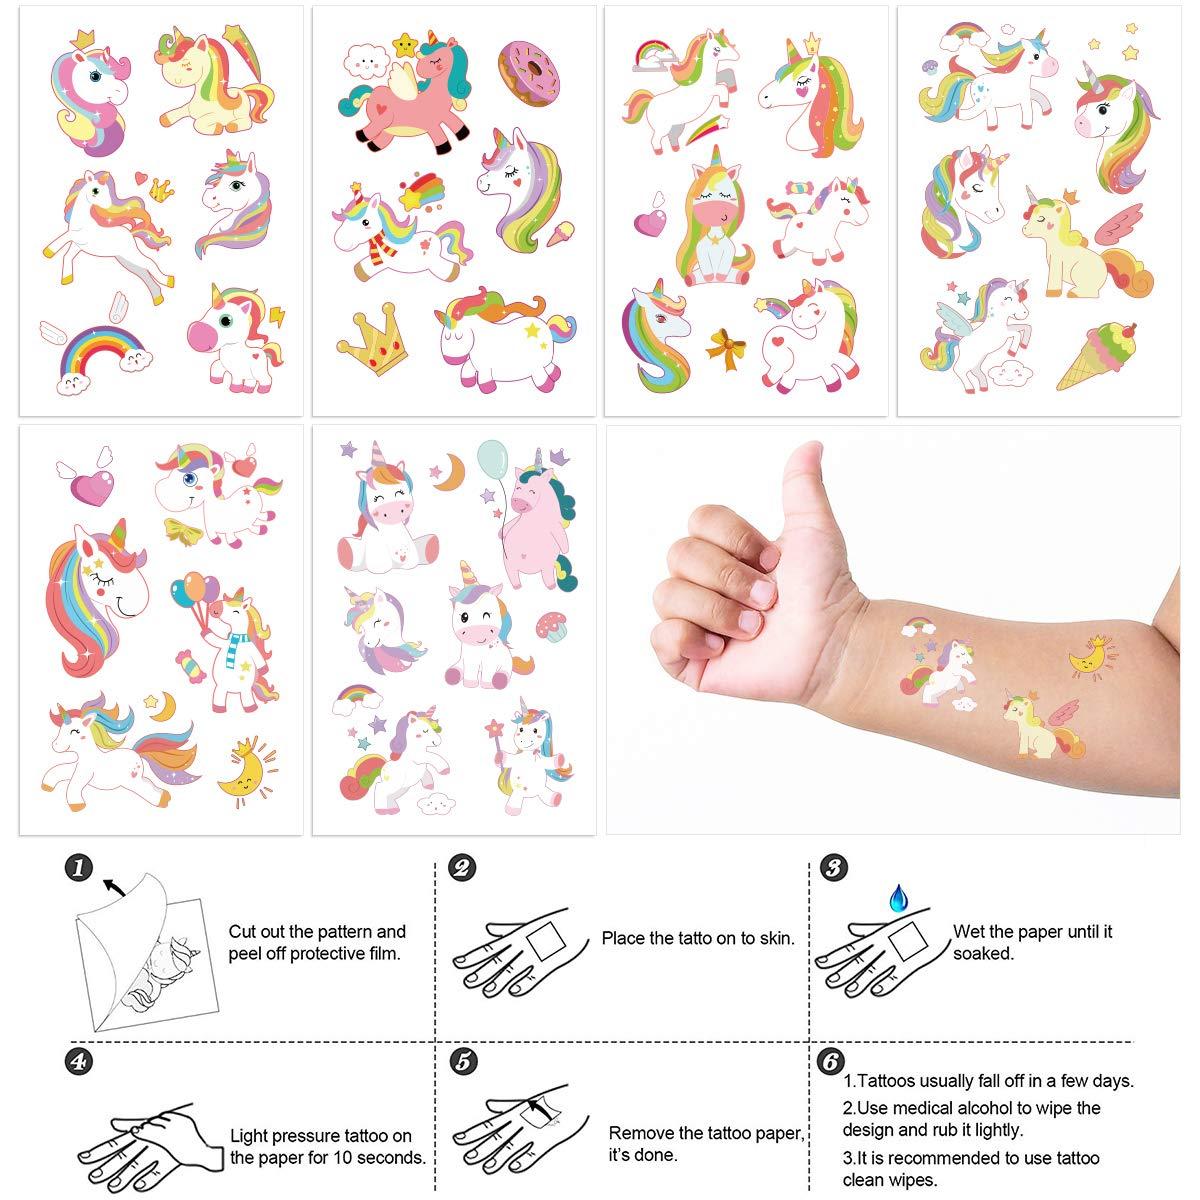 Unicorn Headbands Party Favors Supplies 63PCS Frcolor Unicorn Temporary Tattoos Unicorn Birthday Favors Unicorn Hair Ties Clips for Cosplay Birthday Party Christmas GIft